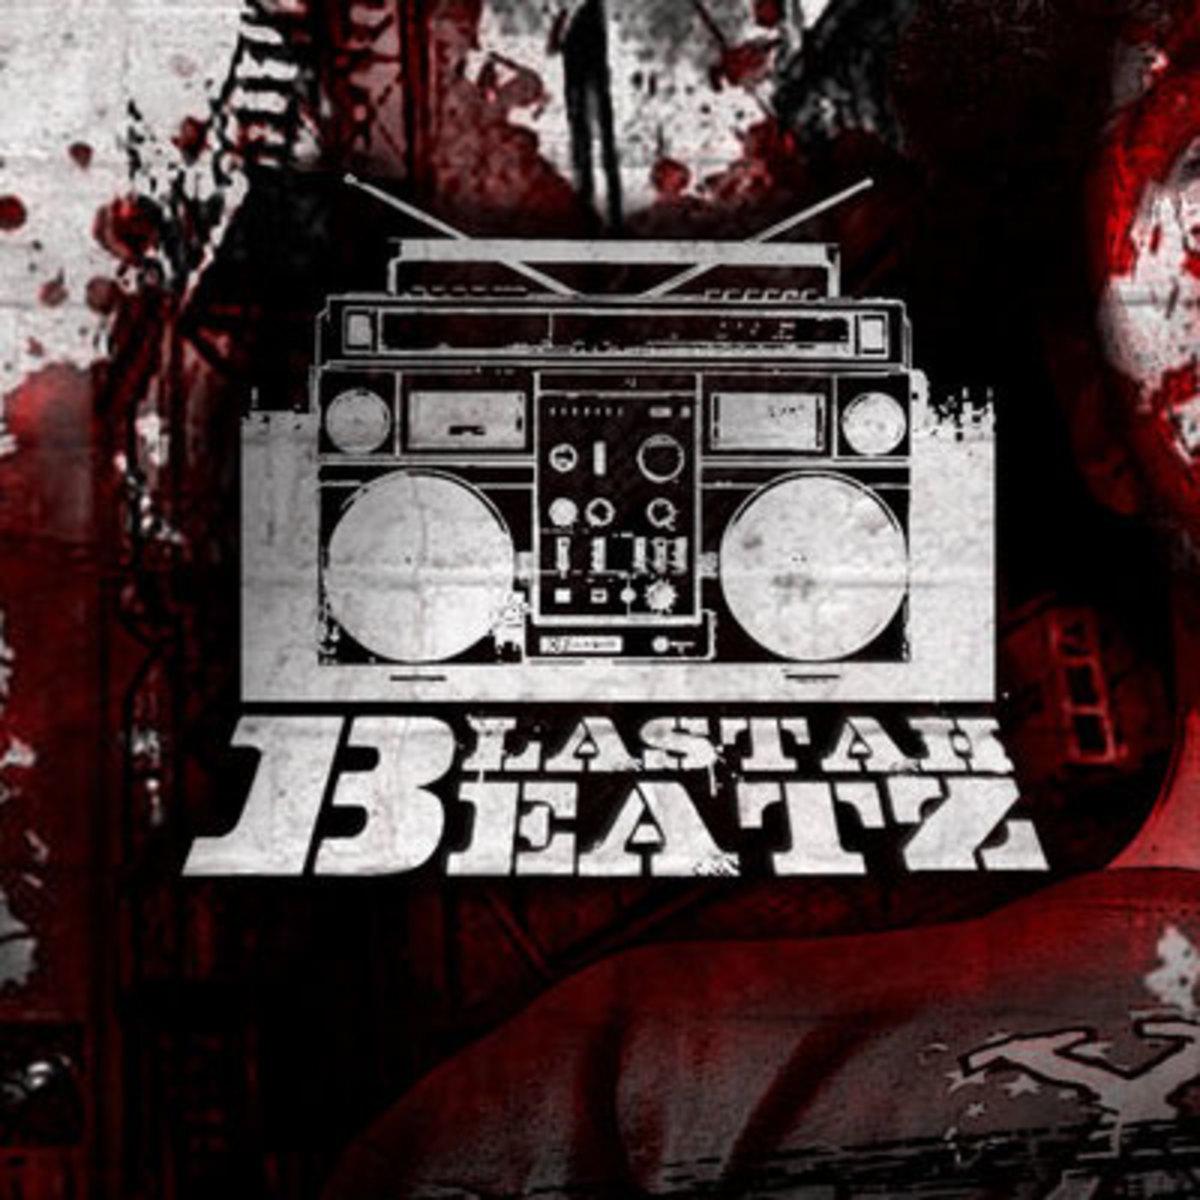 blastahbeatz.jpg